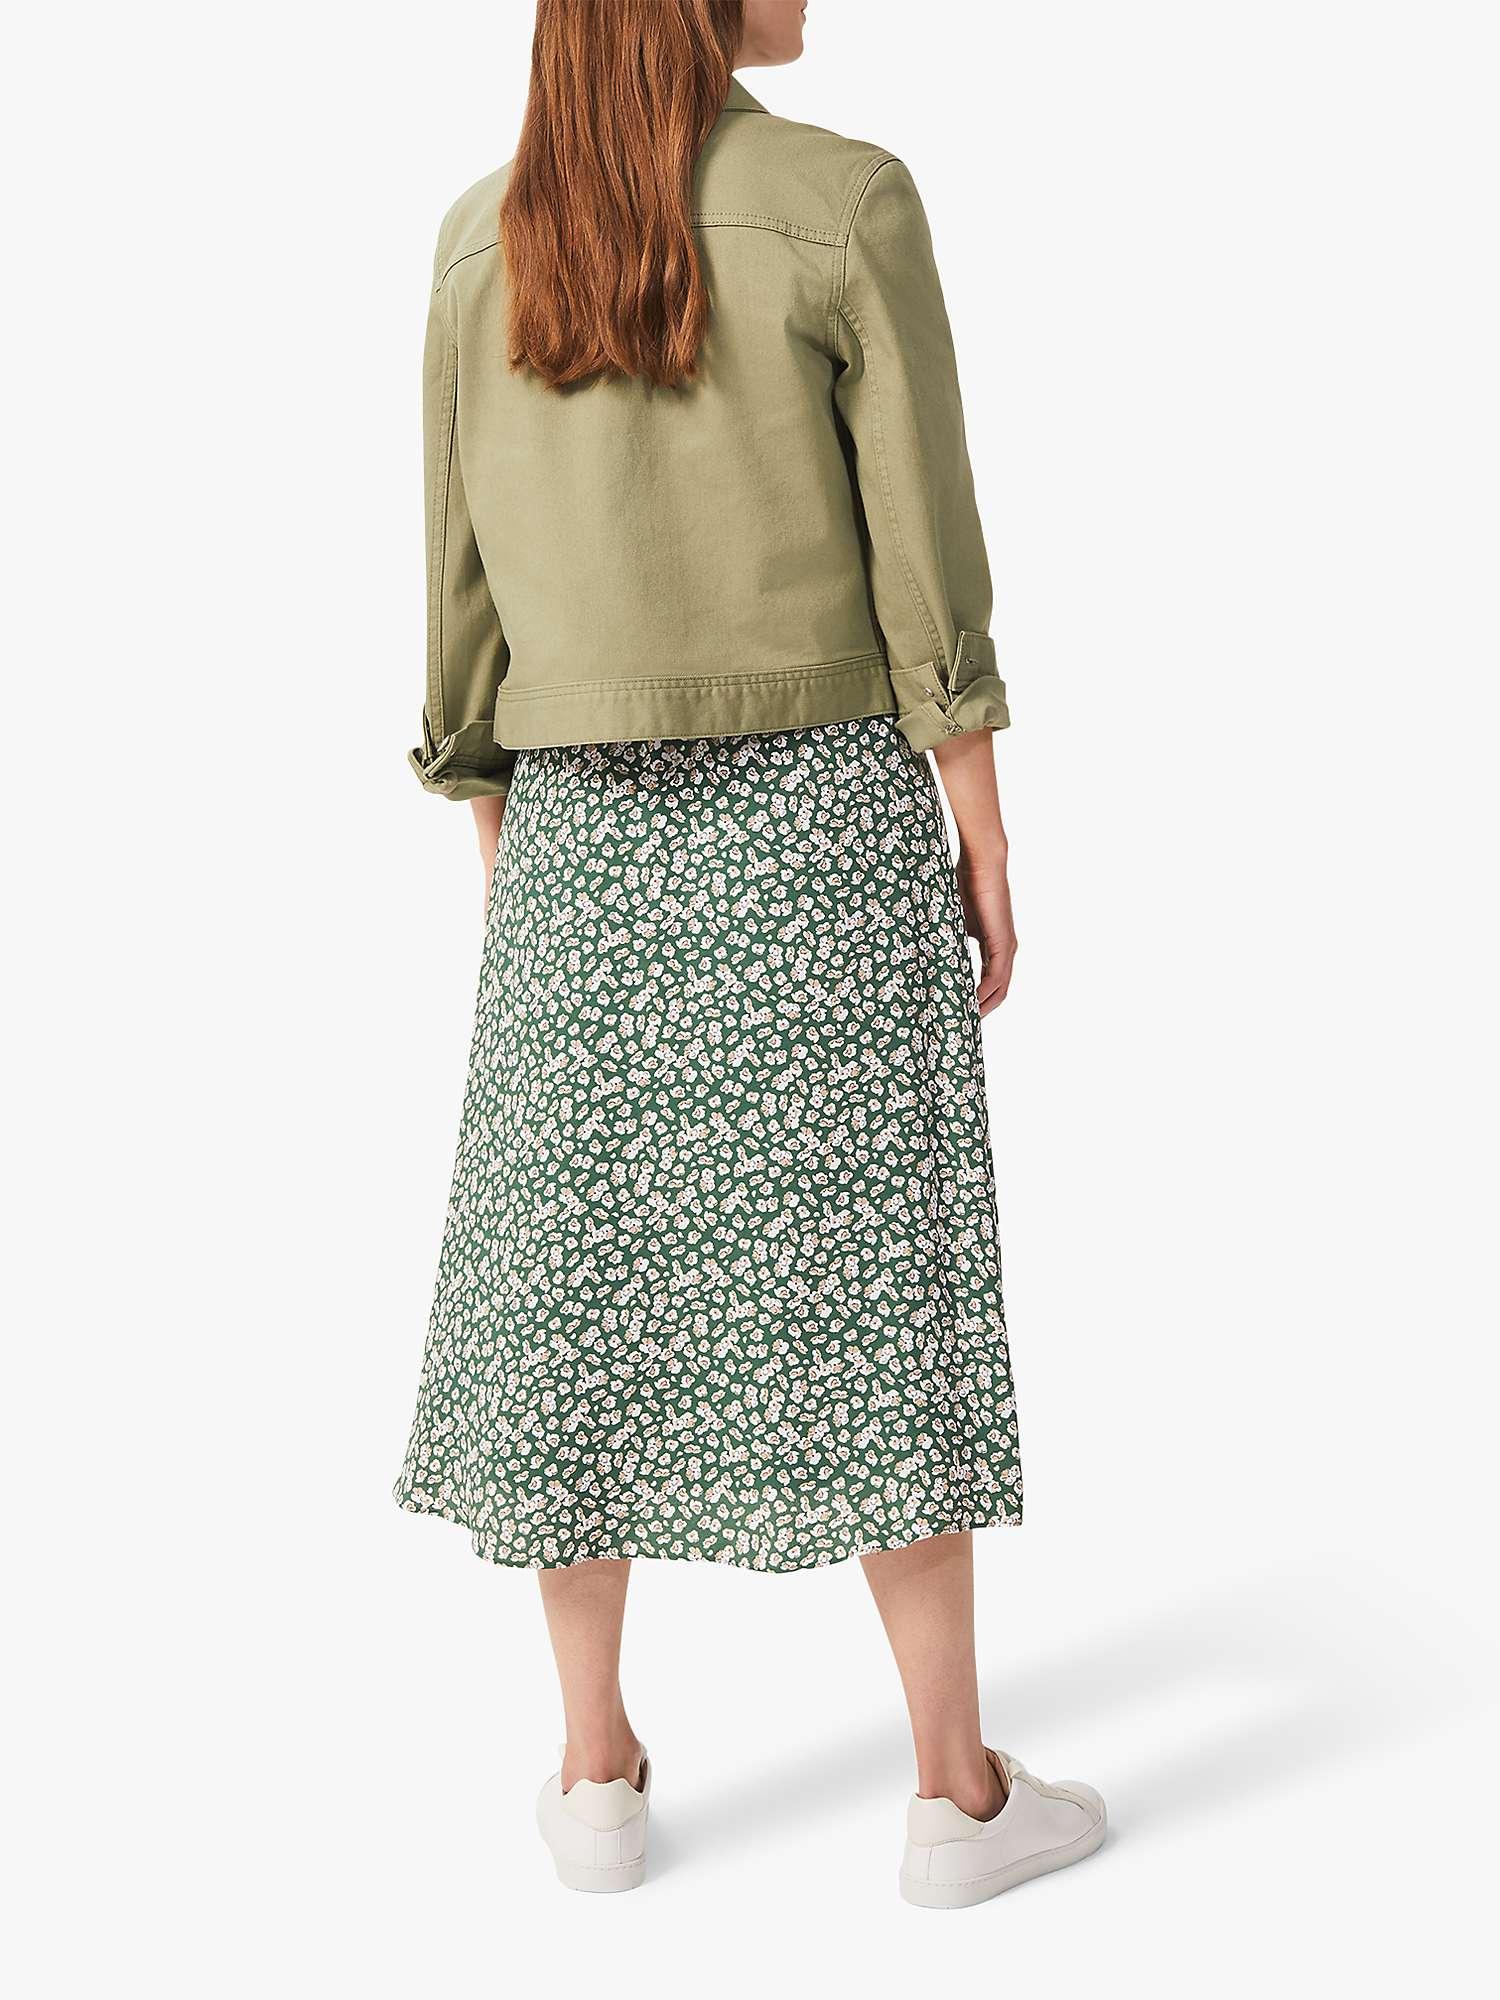 Hobbs Floral Print Midi Skirt, Green/Multi